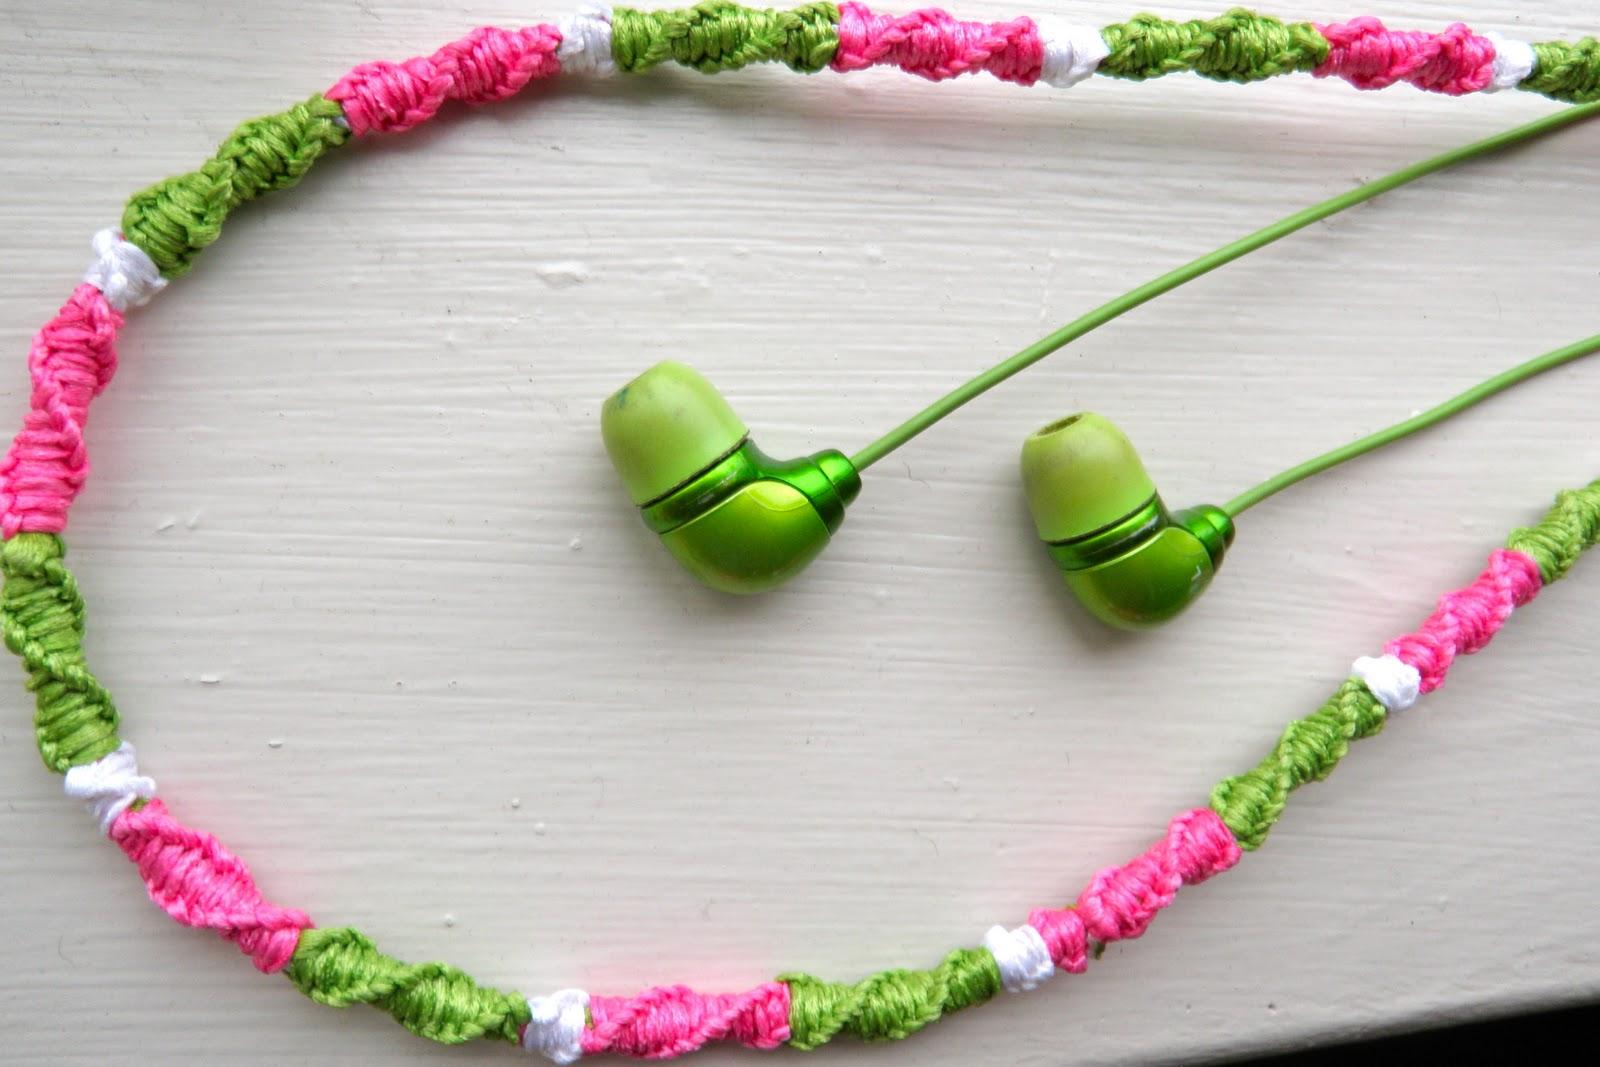 Make A Friendship Bracelet The Easy Way Source · Friendship Bracelet  Archives Fun Family Crafts Diy Heart Friendship Bracelet